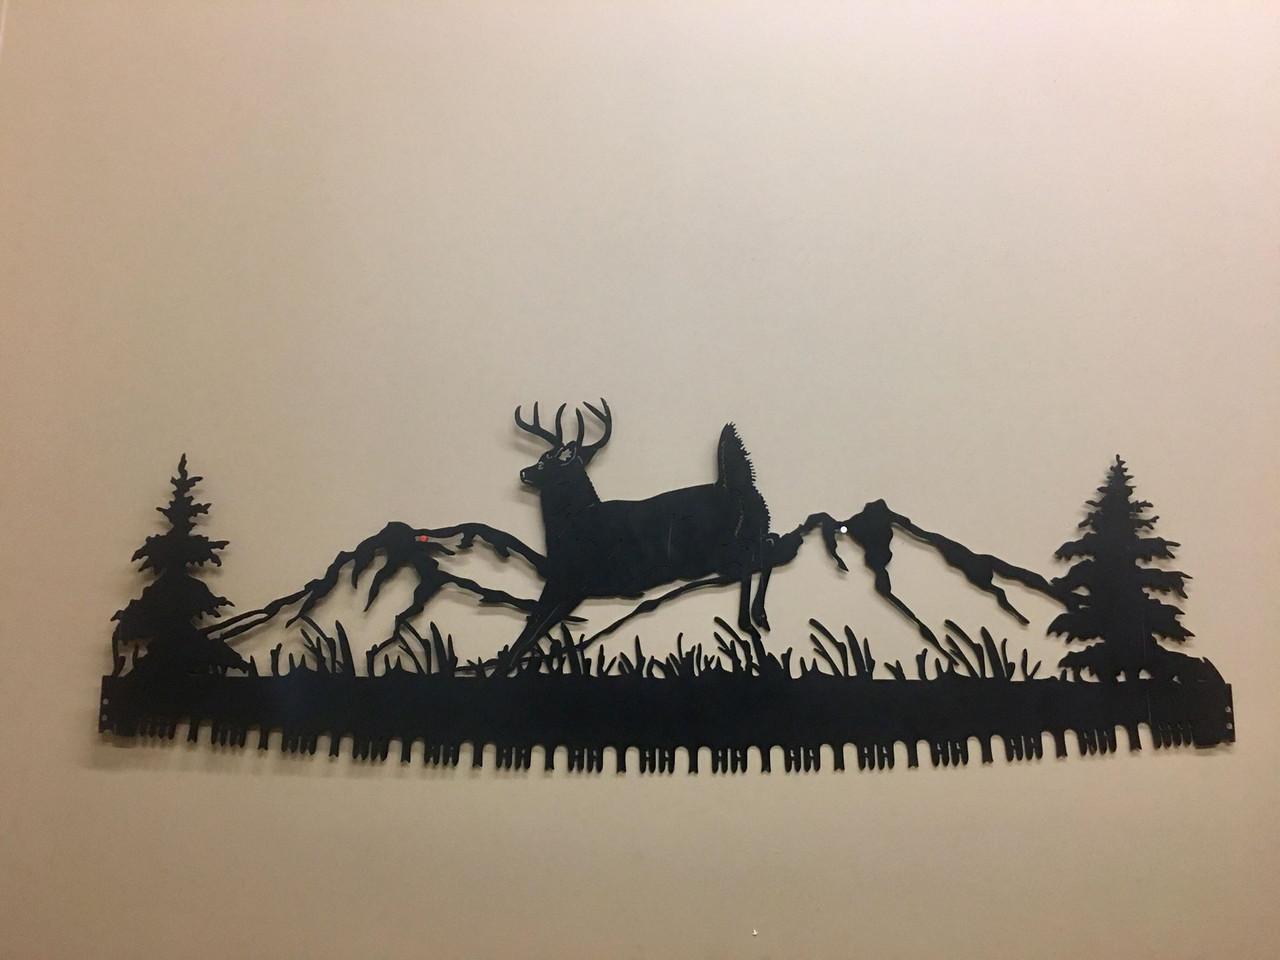 Jumping Deer Crosscut Saw